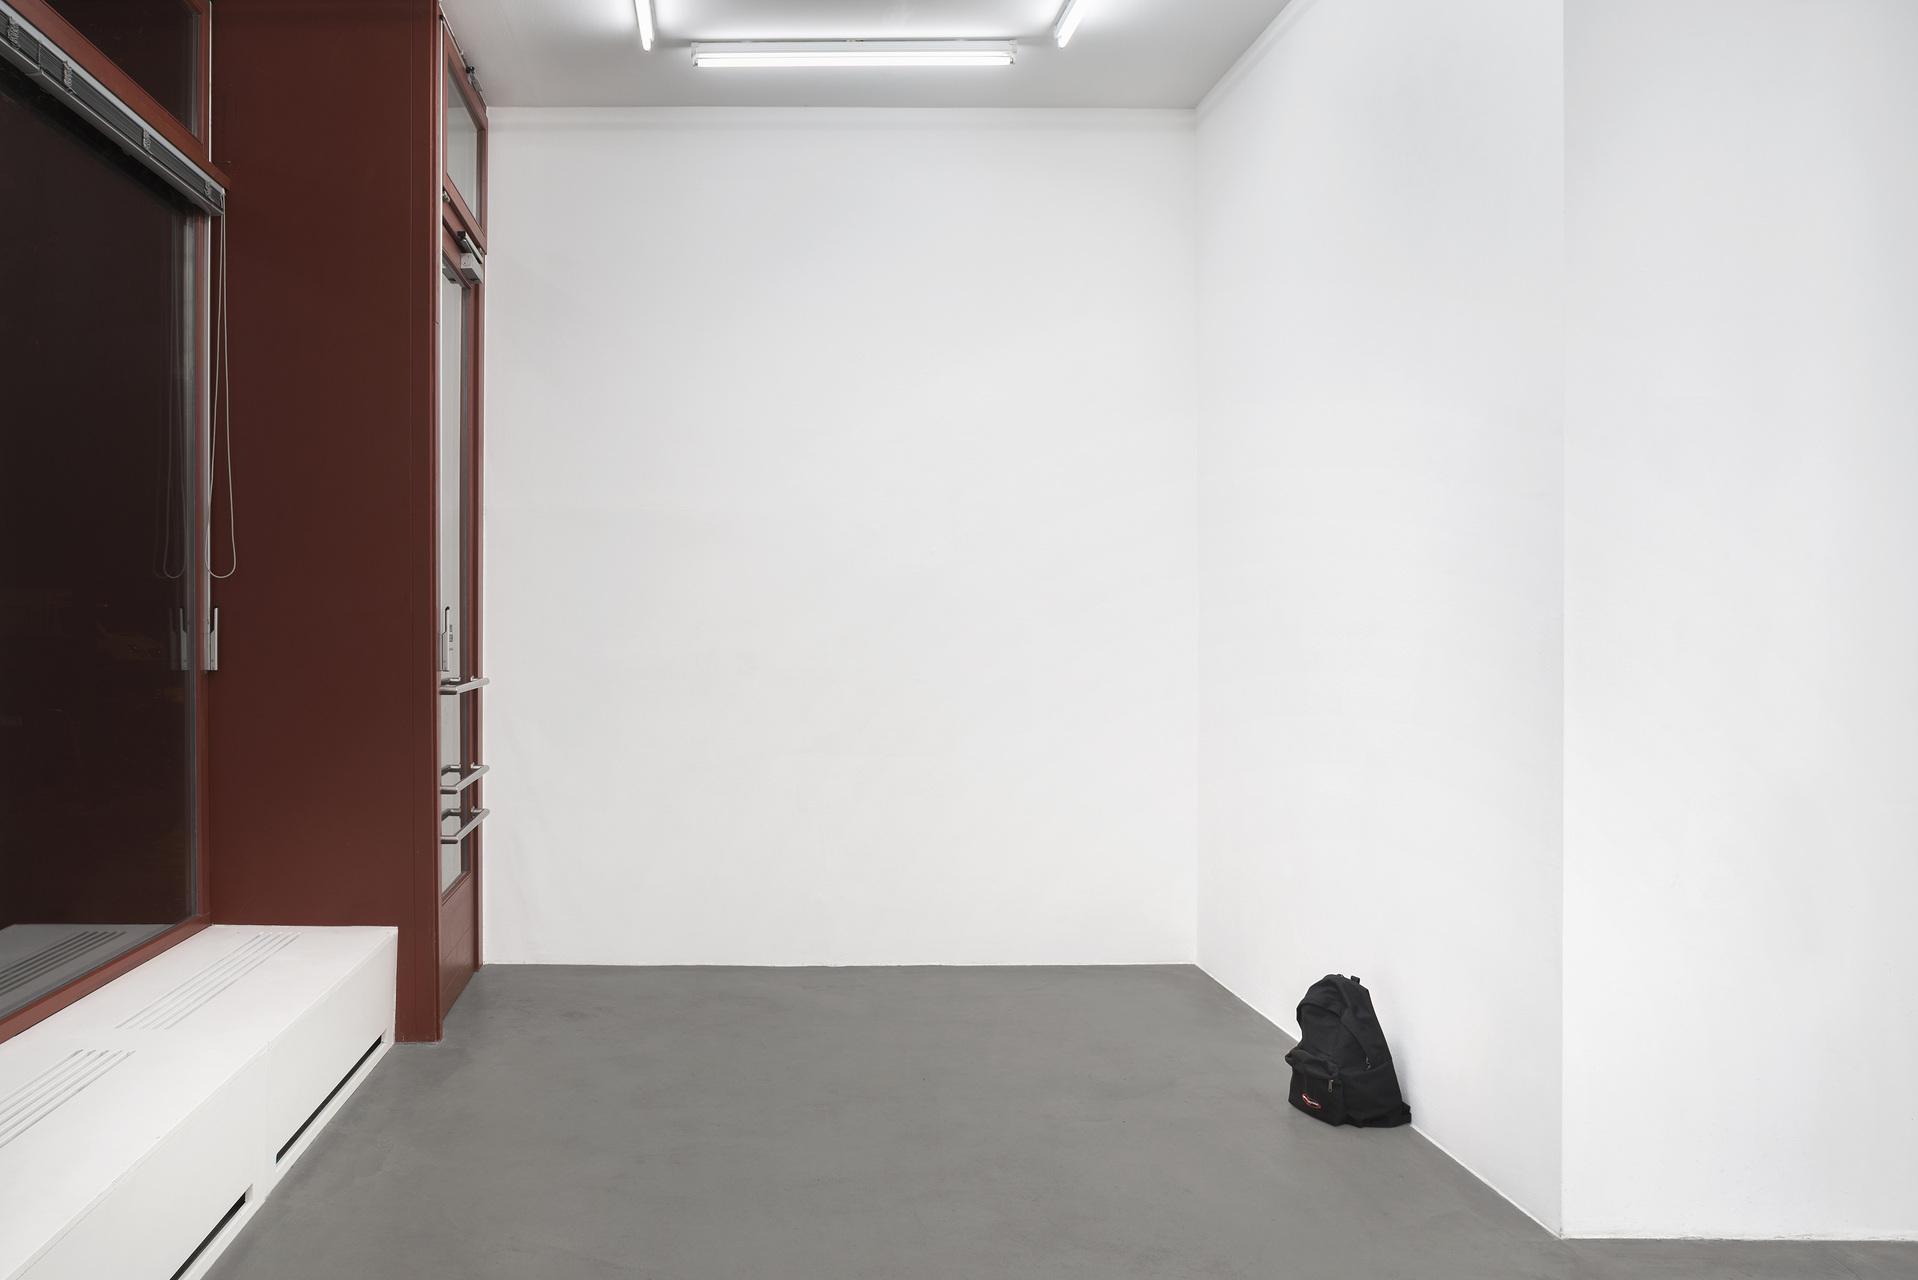 Hundstage_Installation views_2015_3